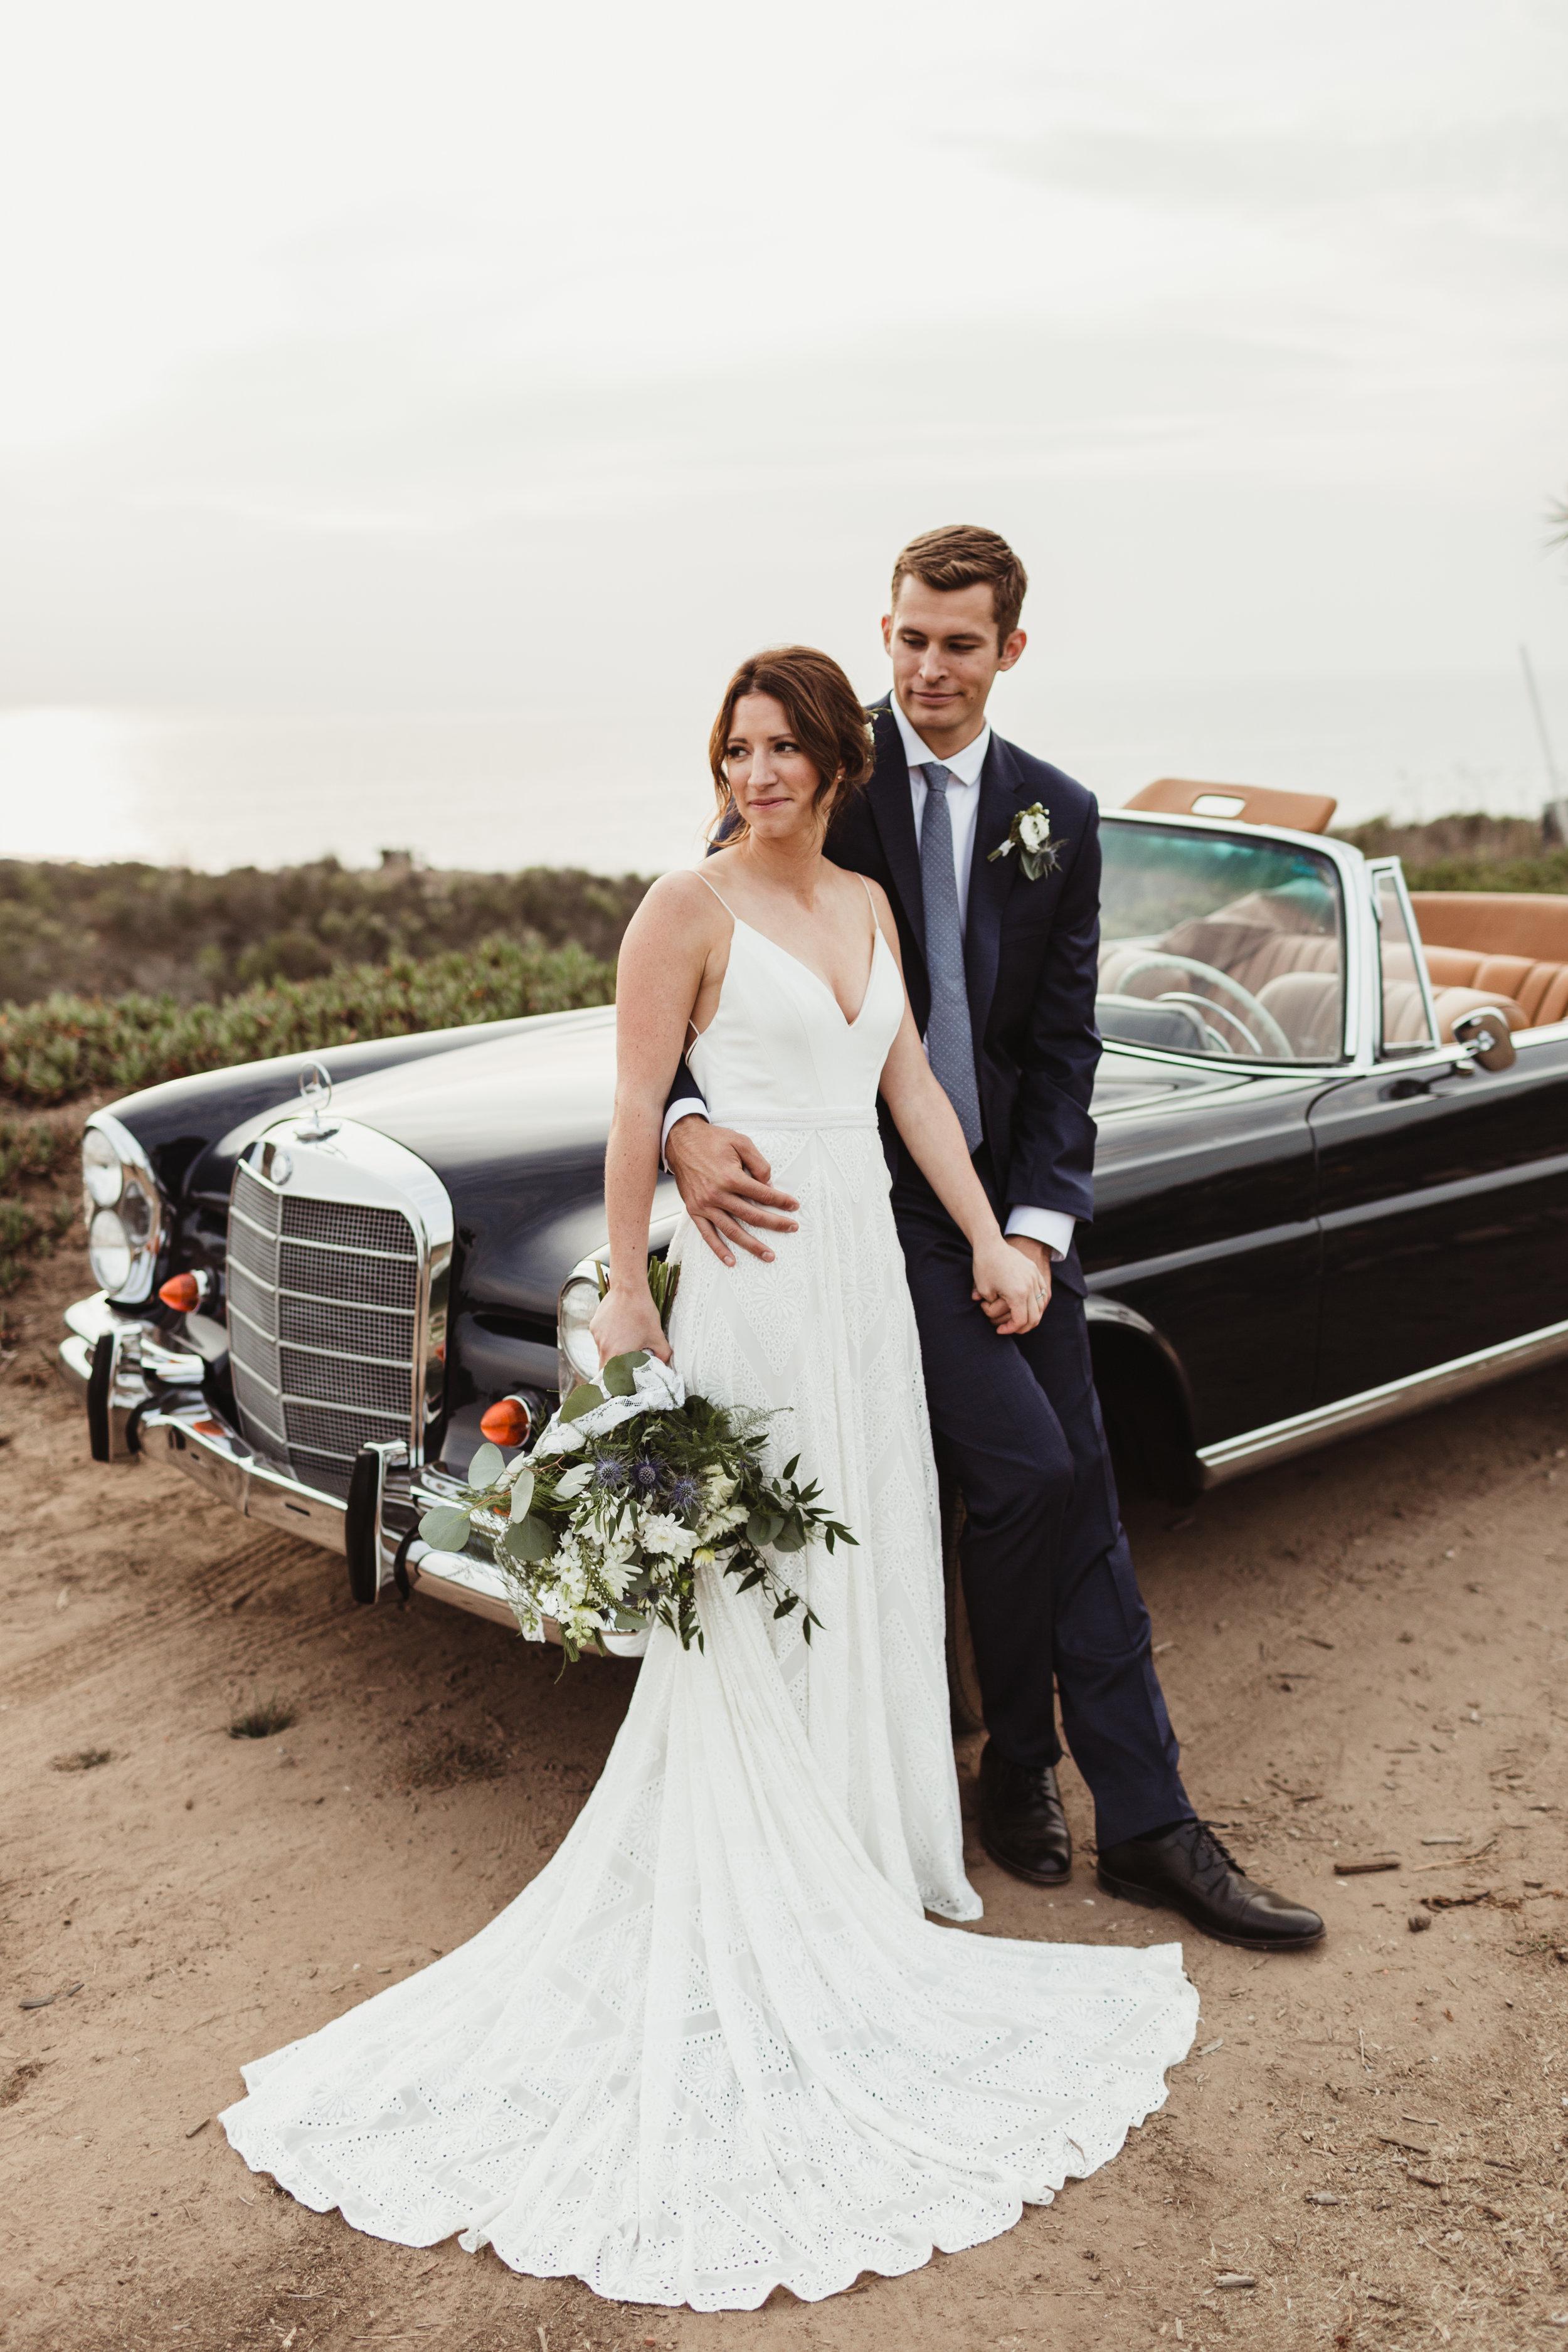 Jamie_English_Photography_JordanErik_Dos_Pueblos_Orchid_Wedding_Santa_Barbara_Fall2018-656.jpg